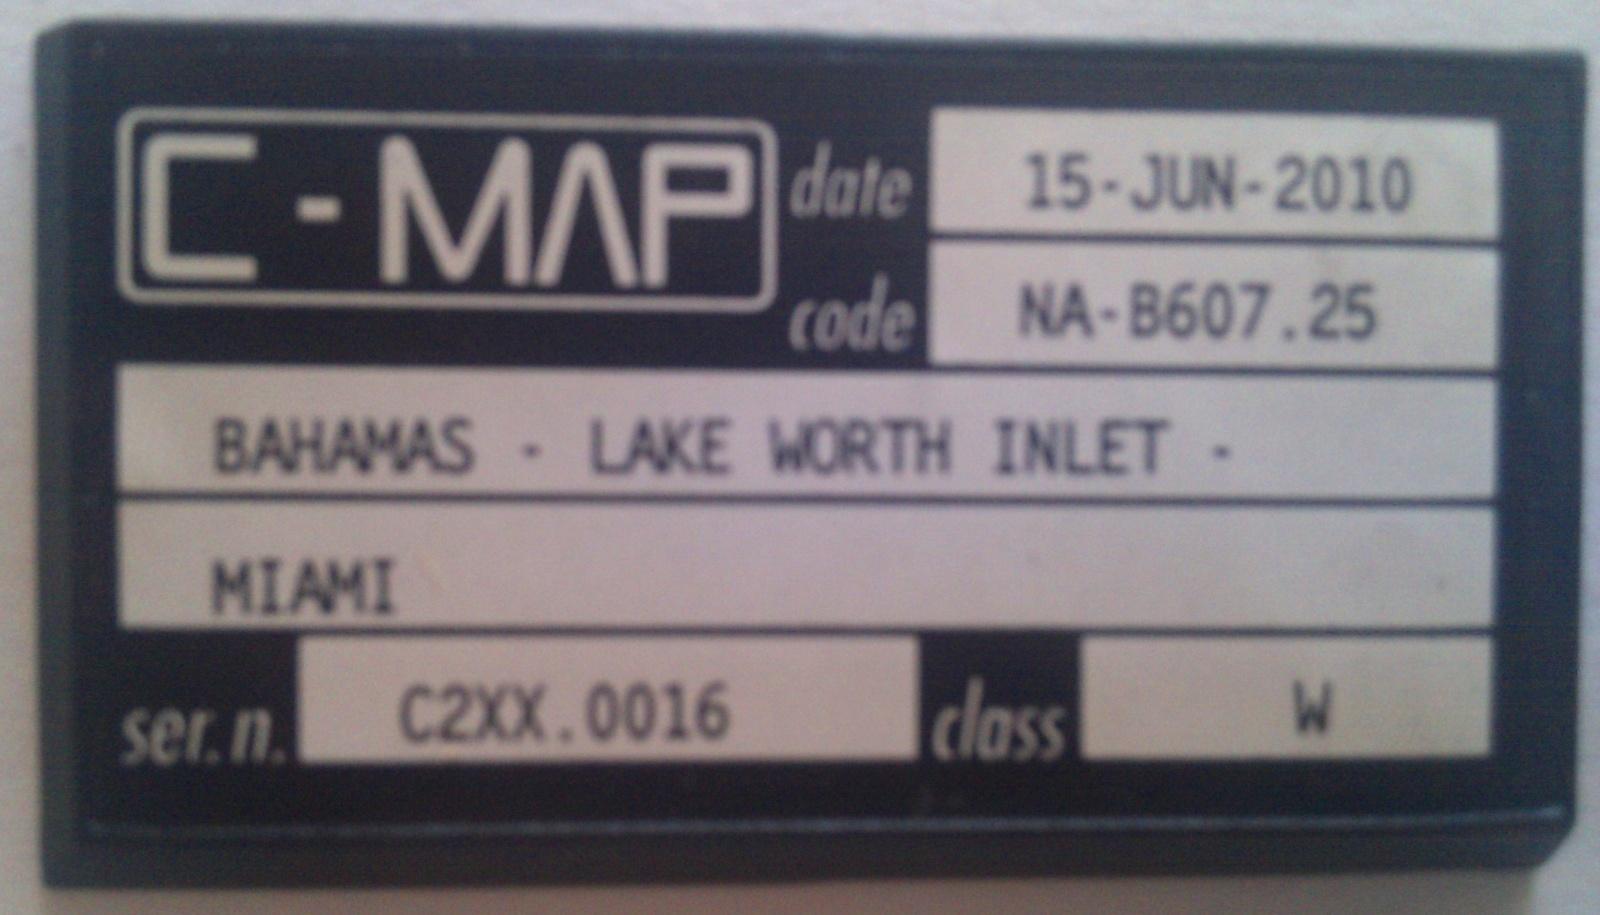 Click image for larger version  Name:C - Map Bahamas - Lake Worth Inlet - Miami.jpg Views:98 Size:345.5 KB ID:41381